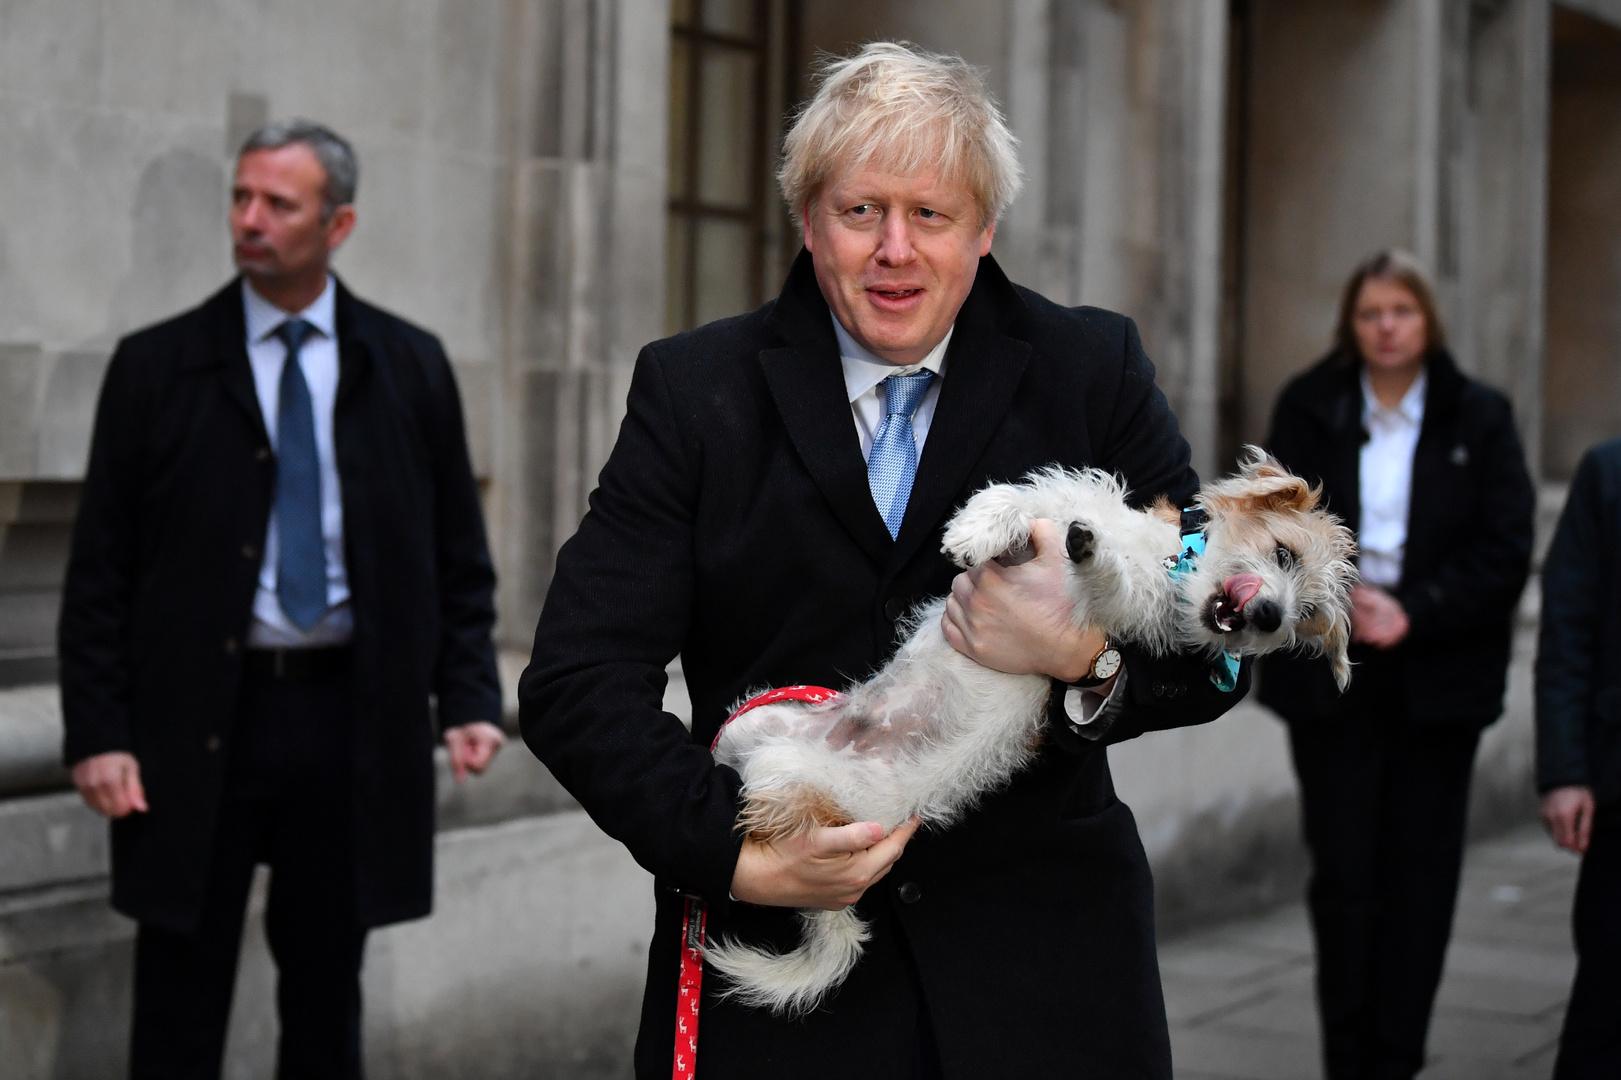 بريطانيا تجري انتخابات ستقرر مصير